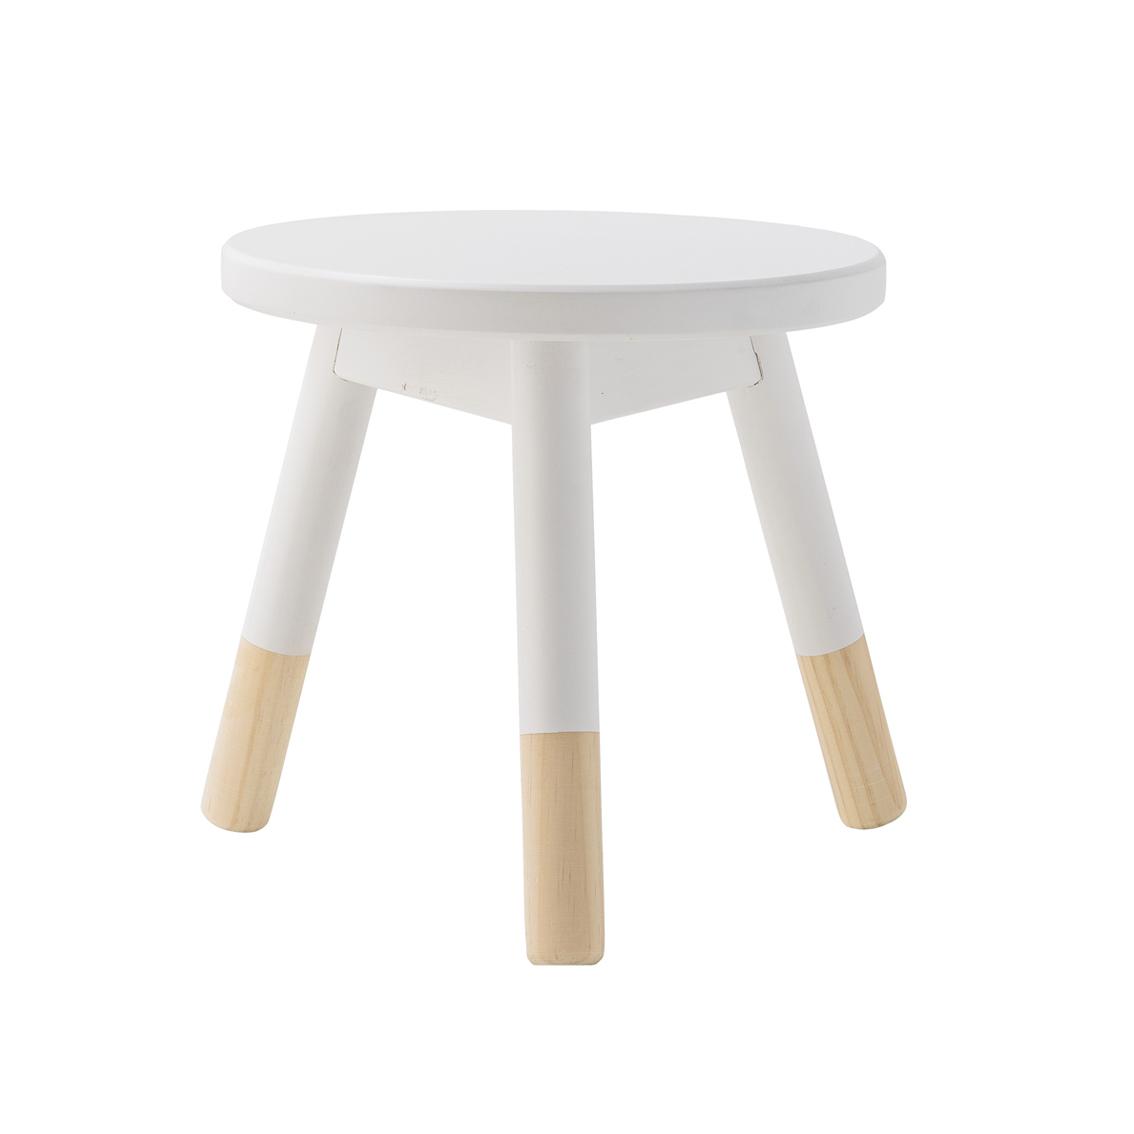 tabouret enfant blanc bloomingville pour chambre enfant. Black Bedroom Furniture Sets. Home Design Ideas